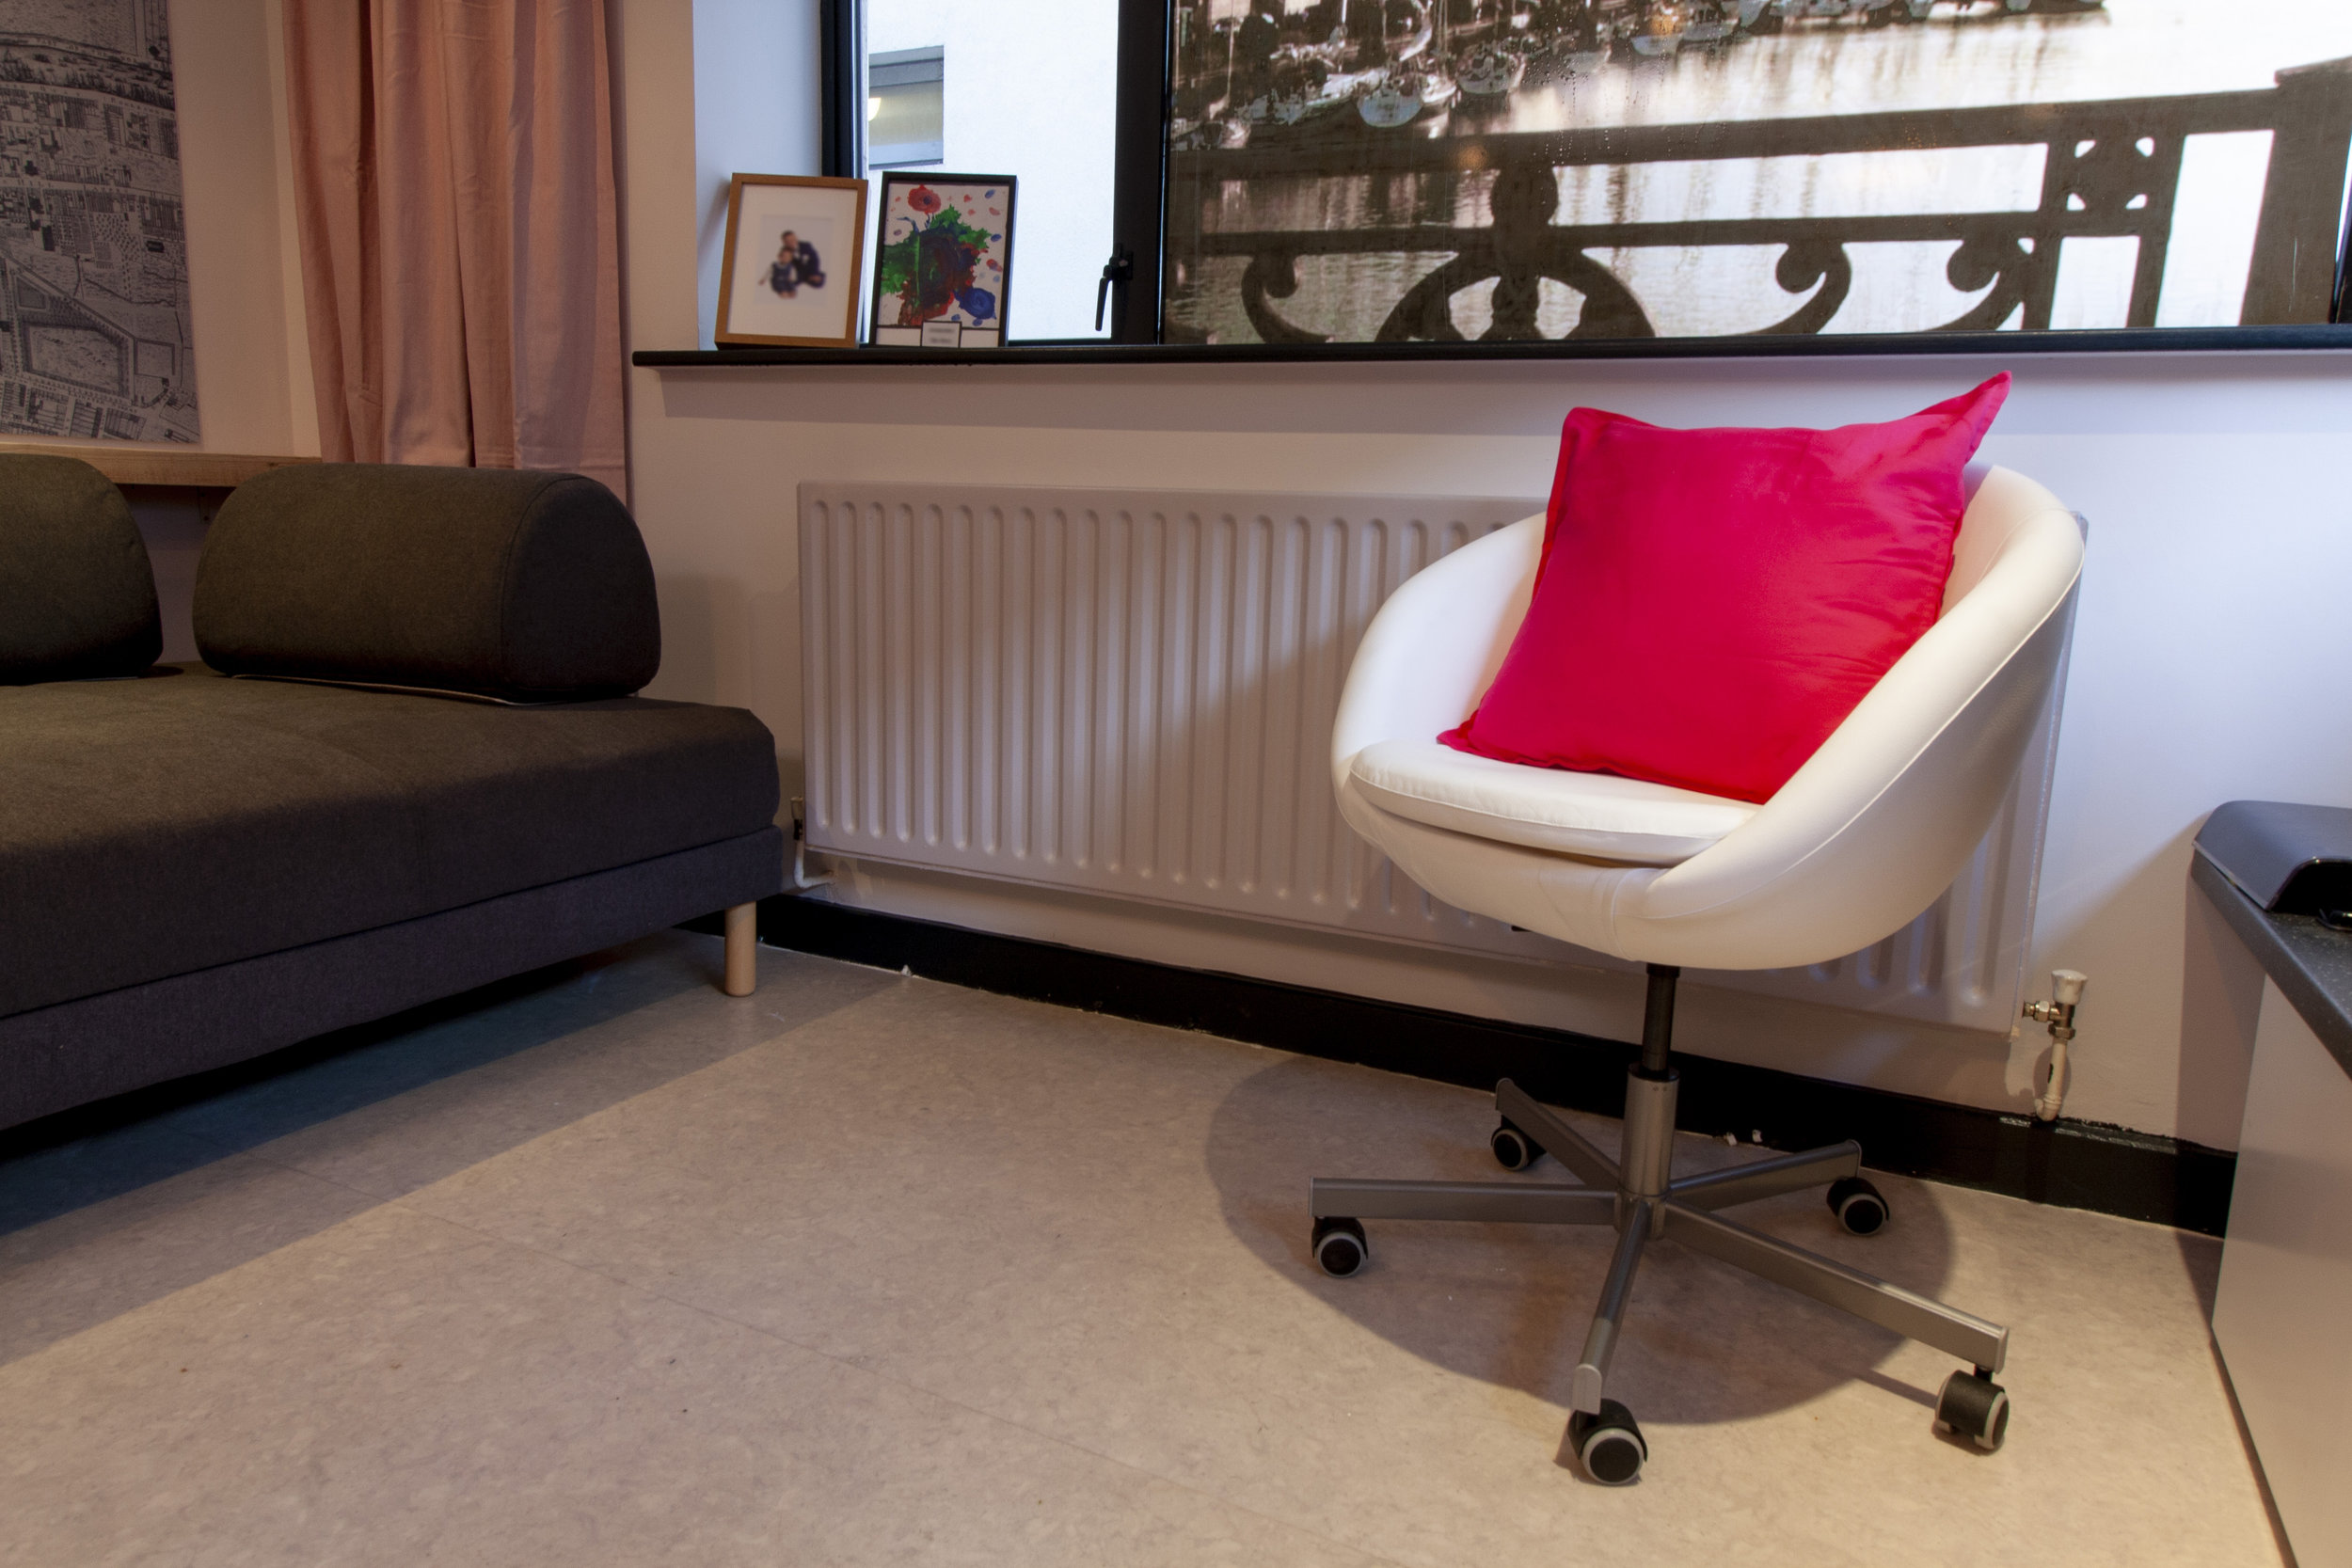 HR - Dublin 1 - After - Living Room Kitchen 9.jpg